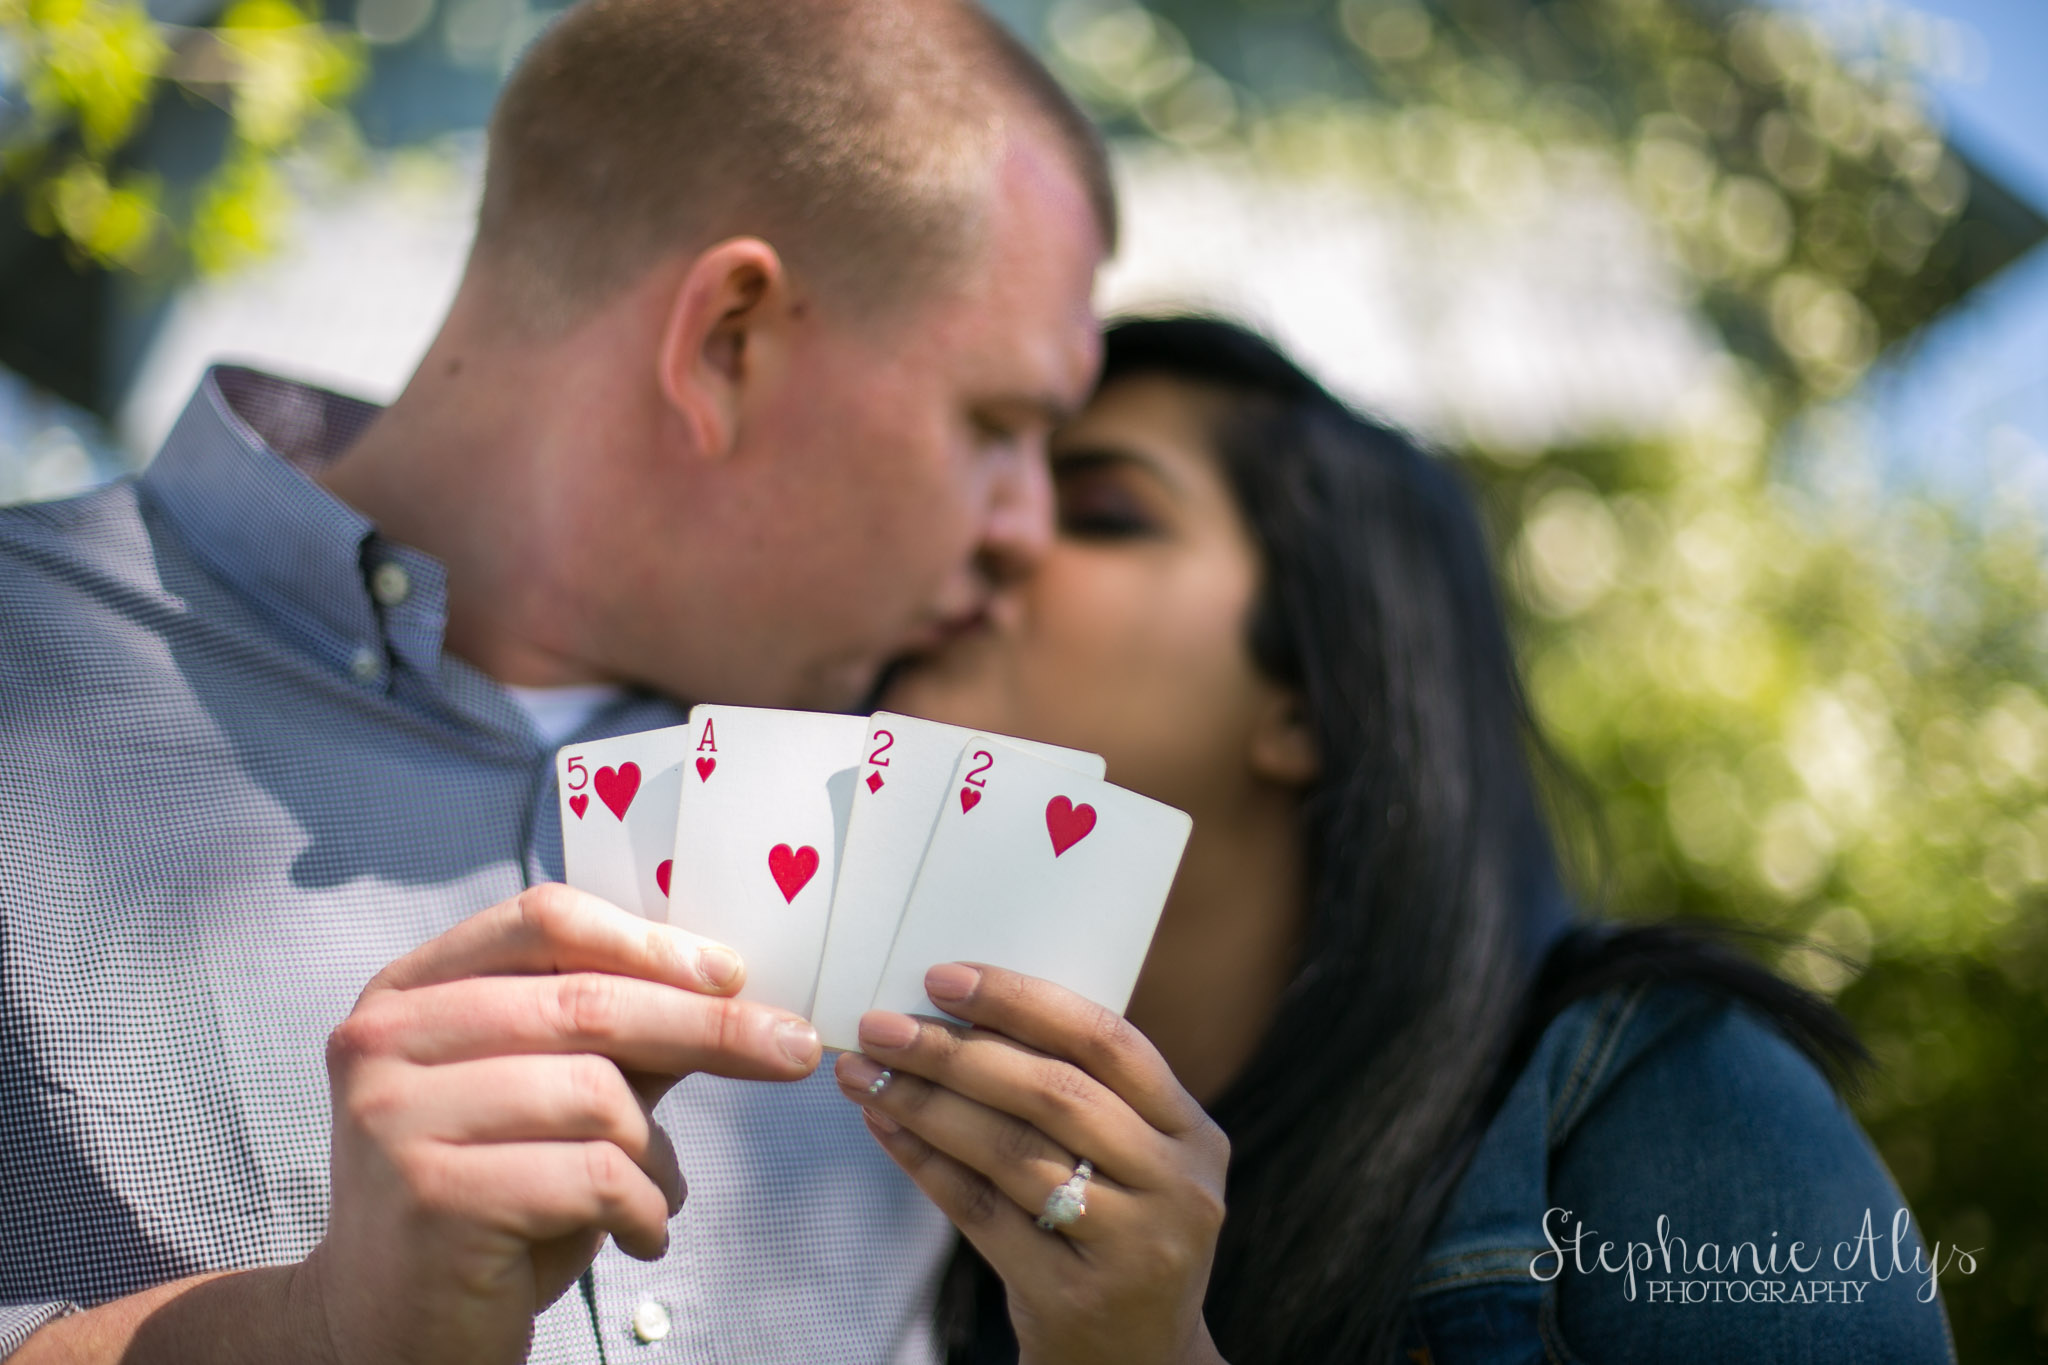 Meena & Adam • Lucky in Love   Cypress, Texas Engagement Photographer   Stephanie Alys Photography